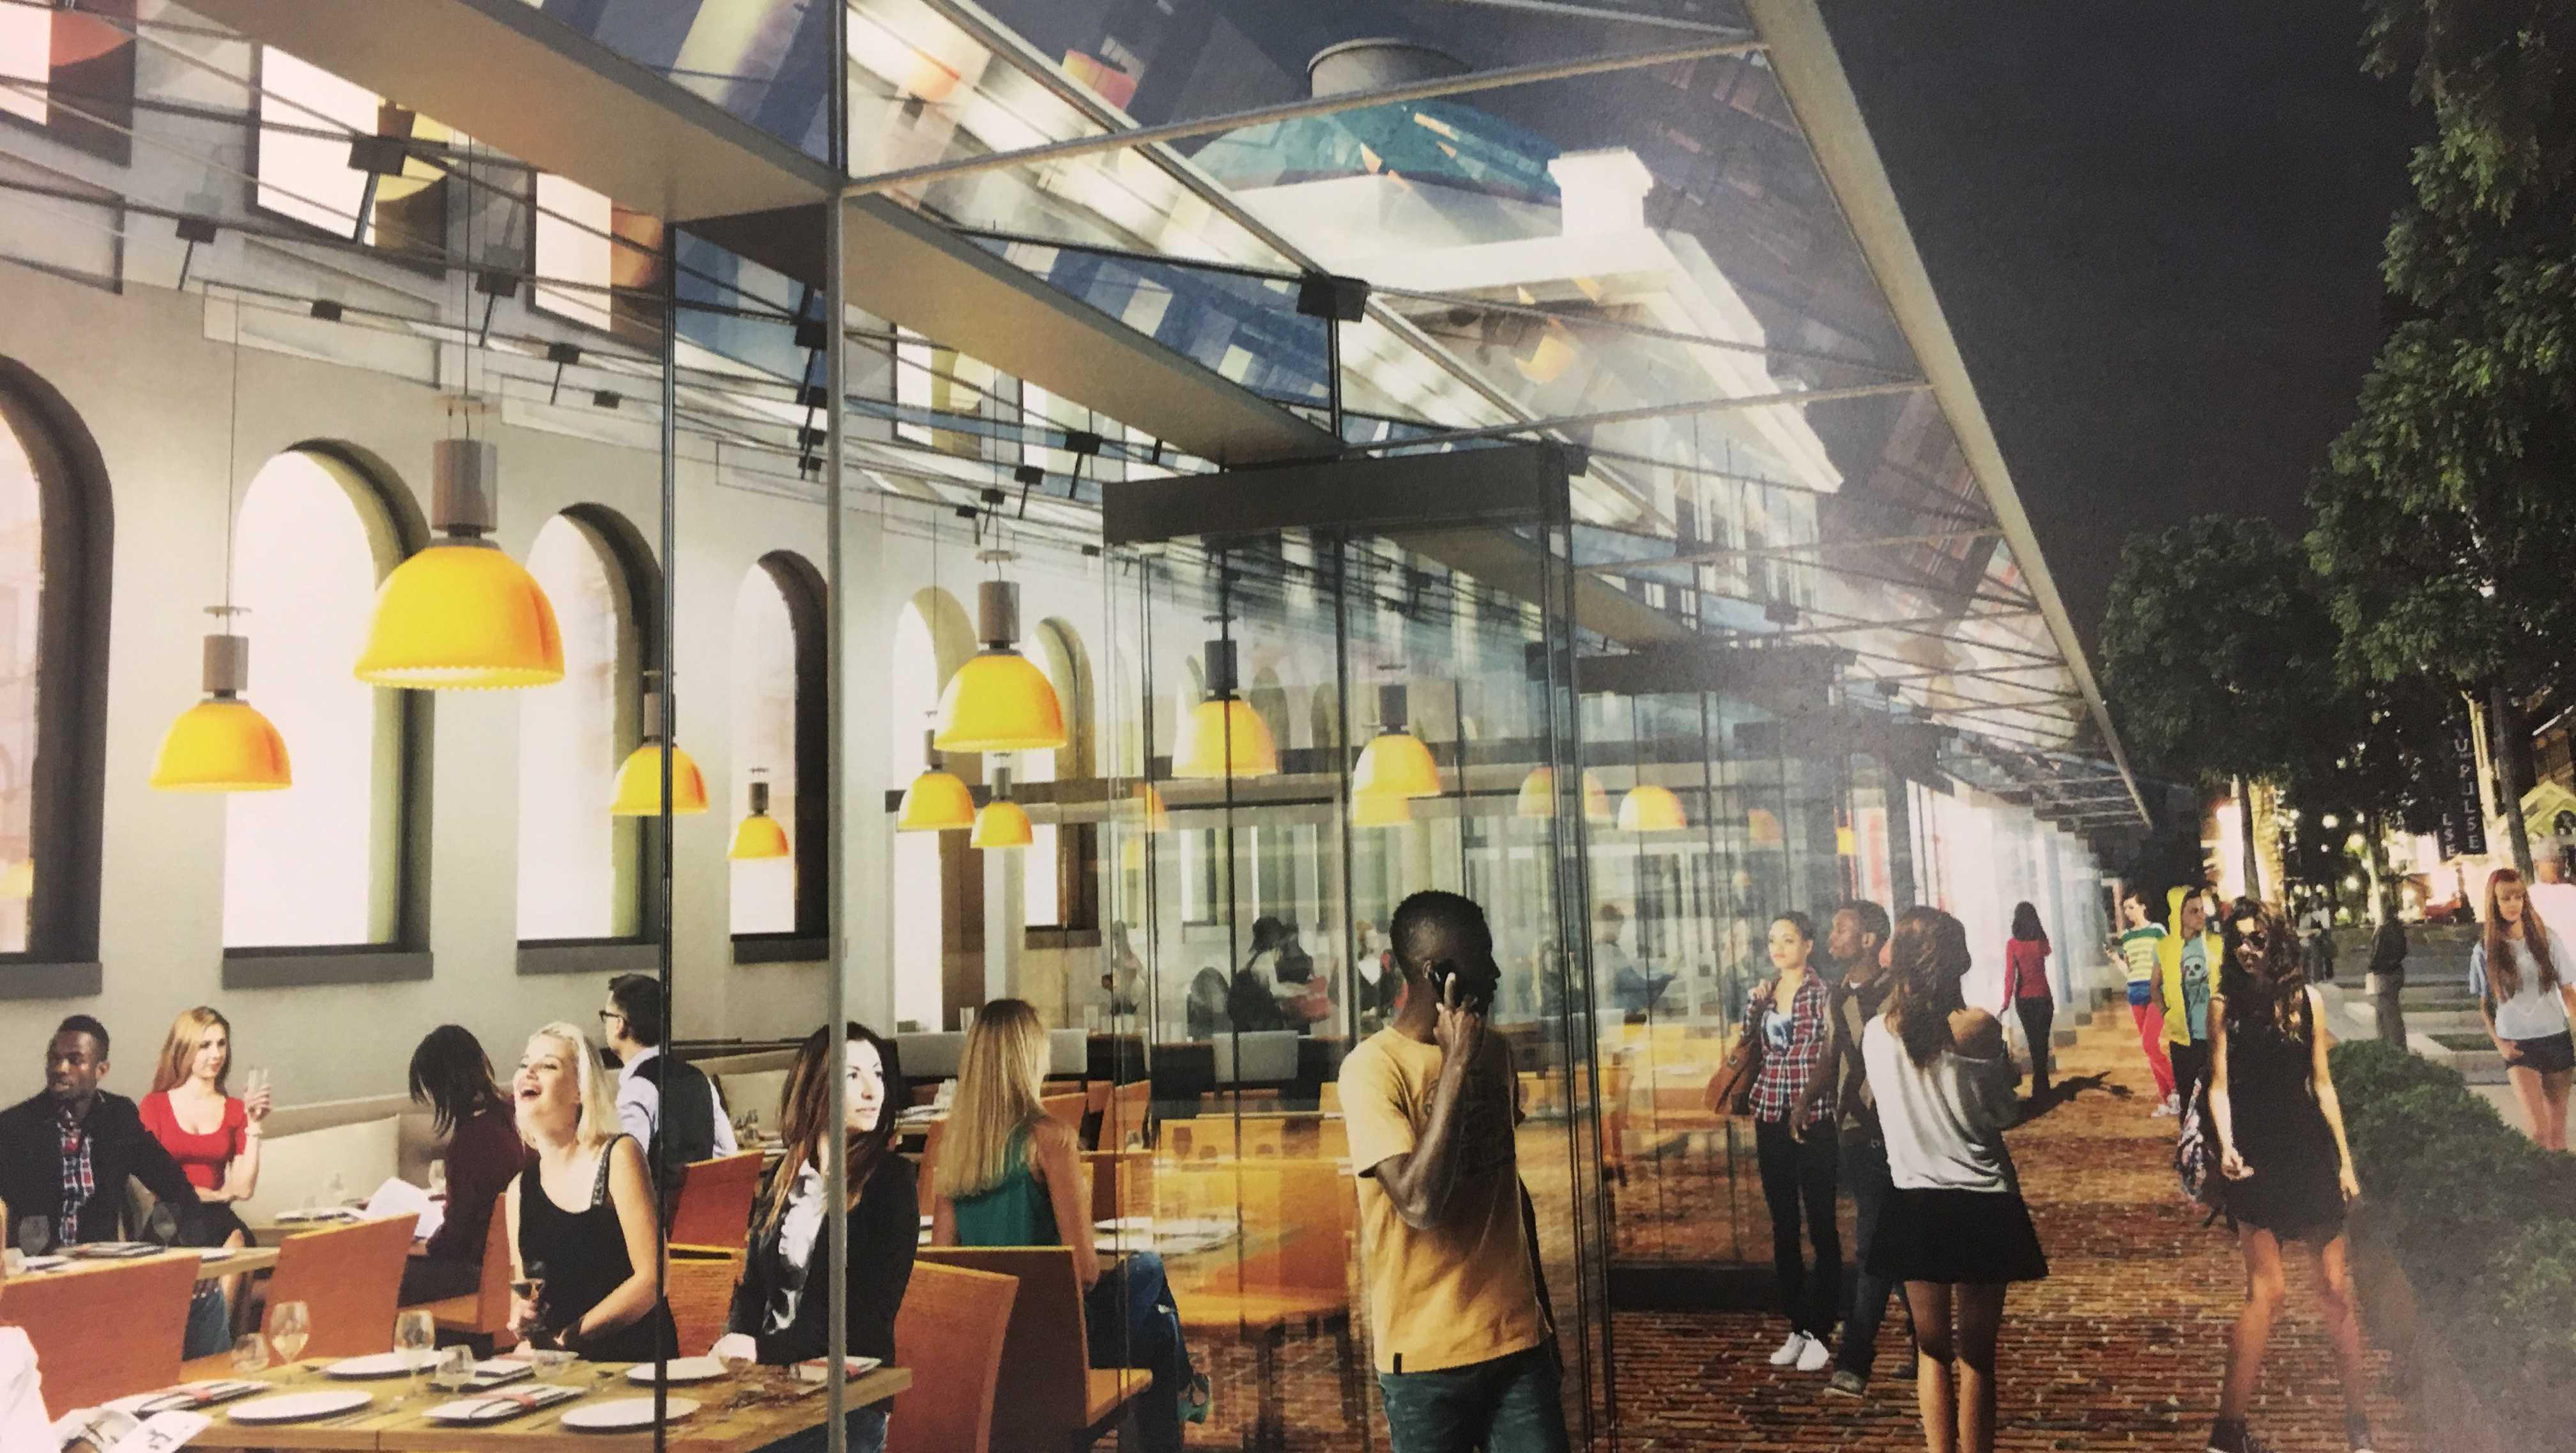 Faneuil Hall renderings